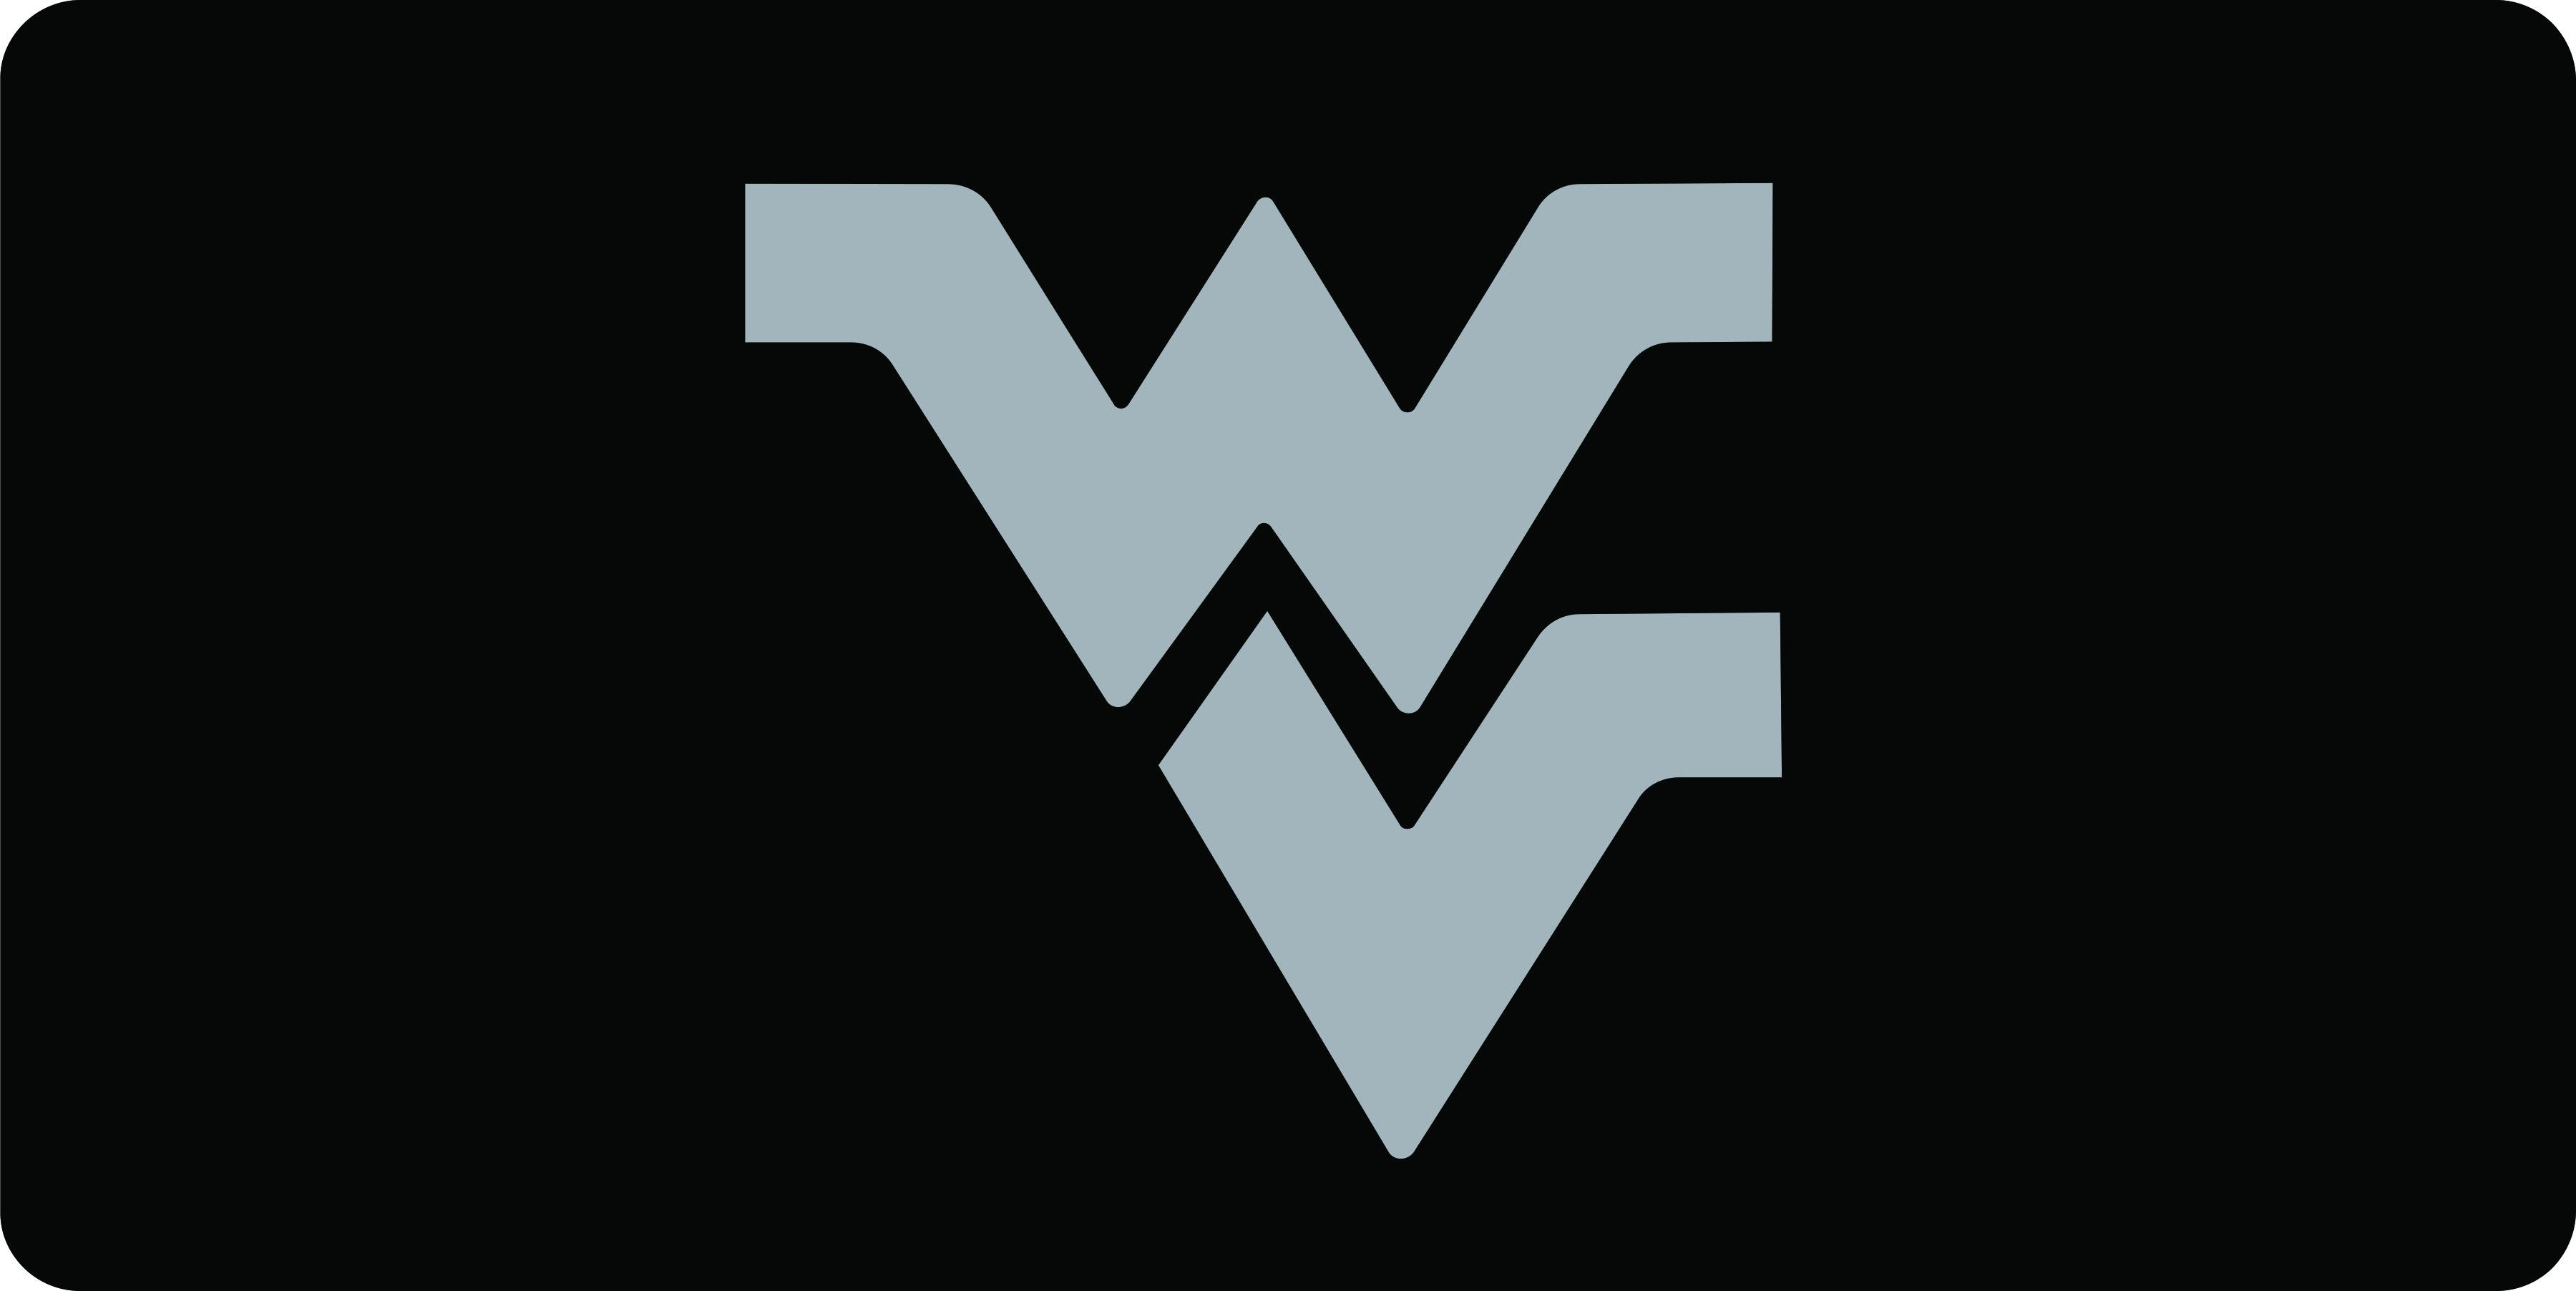 Wvu Silver Wv Logo Black Mirror License Plate Black Mirror Wv Logo License Plate [ 1804 x 3600 Pixel ]